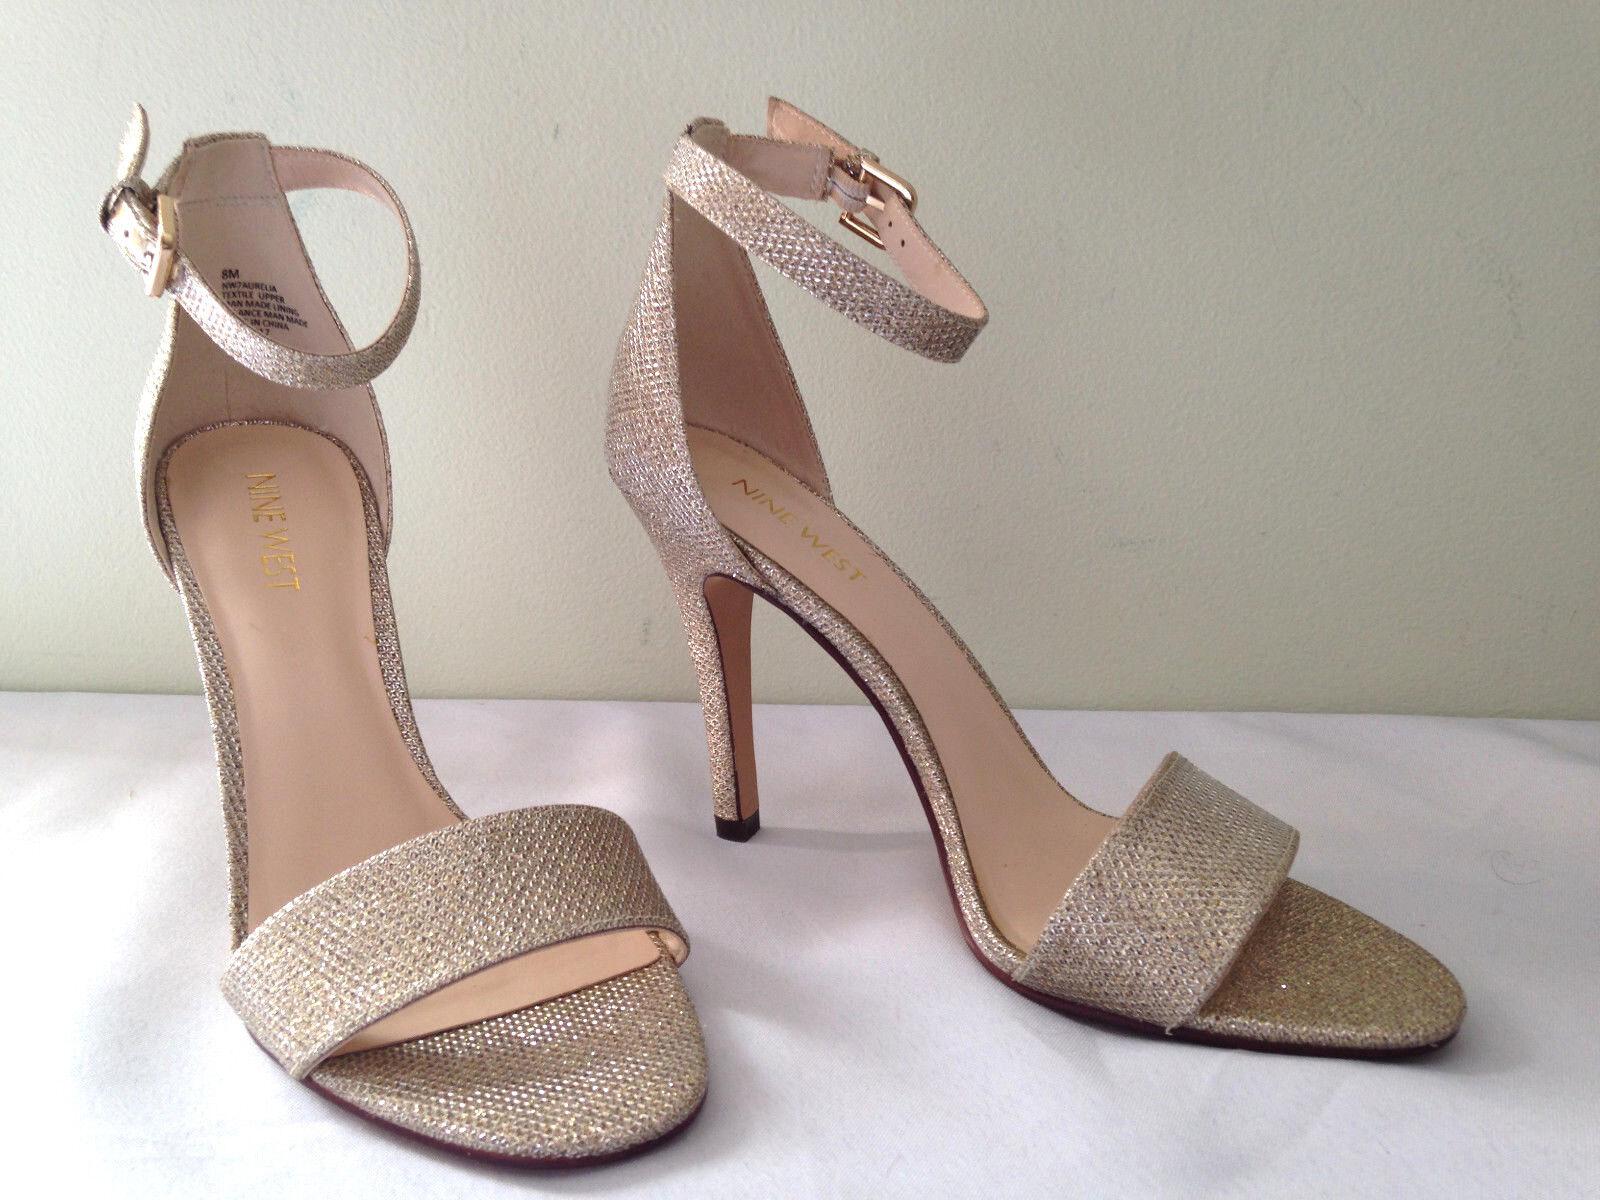 NEW Nine West Gorgeous Gold NW7 AURELIA Heels Ankle Strap Classic Heels AURELIA 8.5 M 135 a54bda